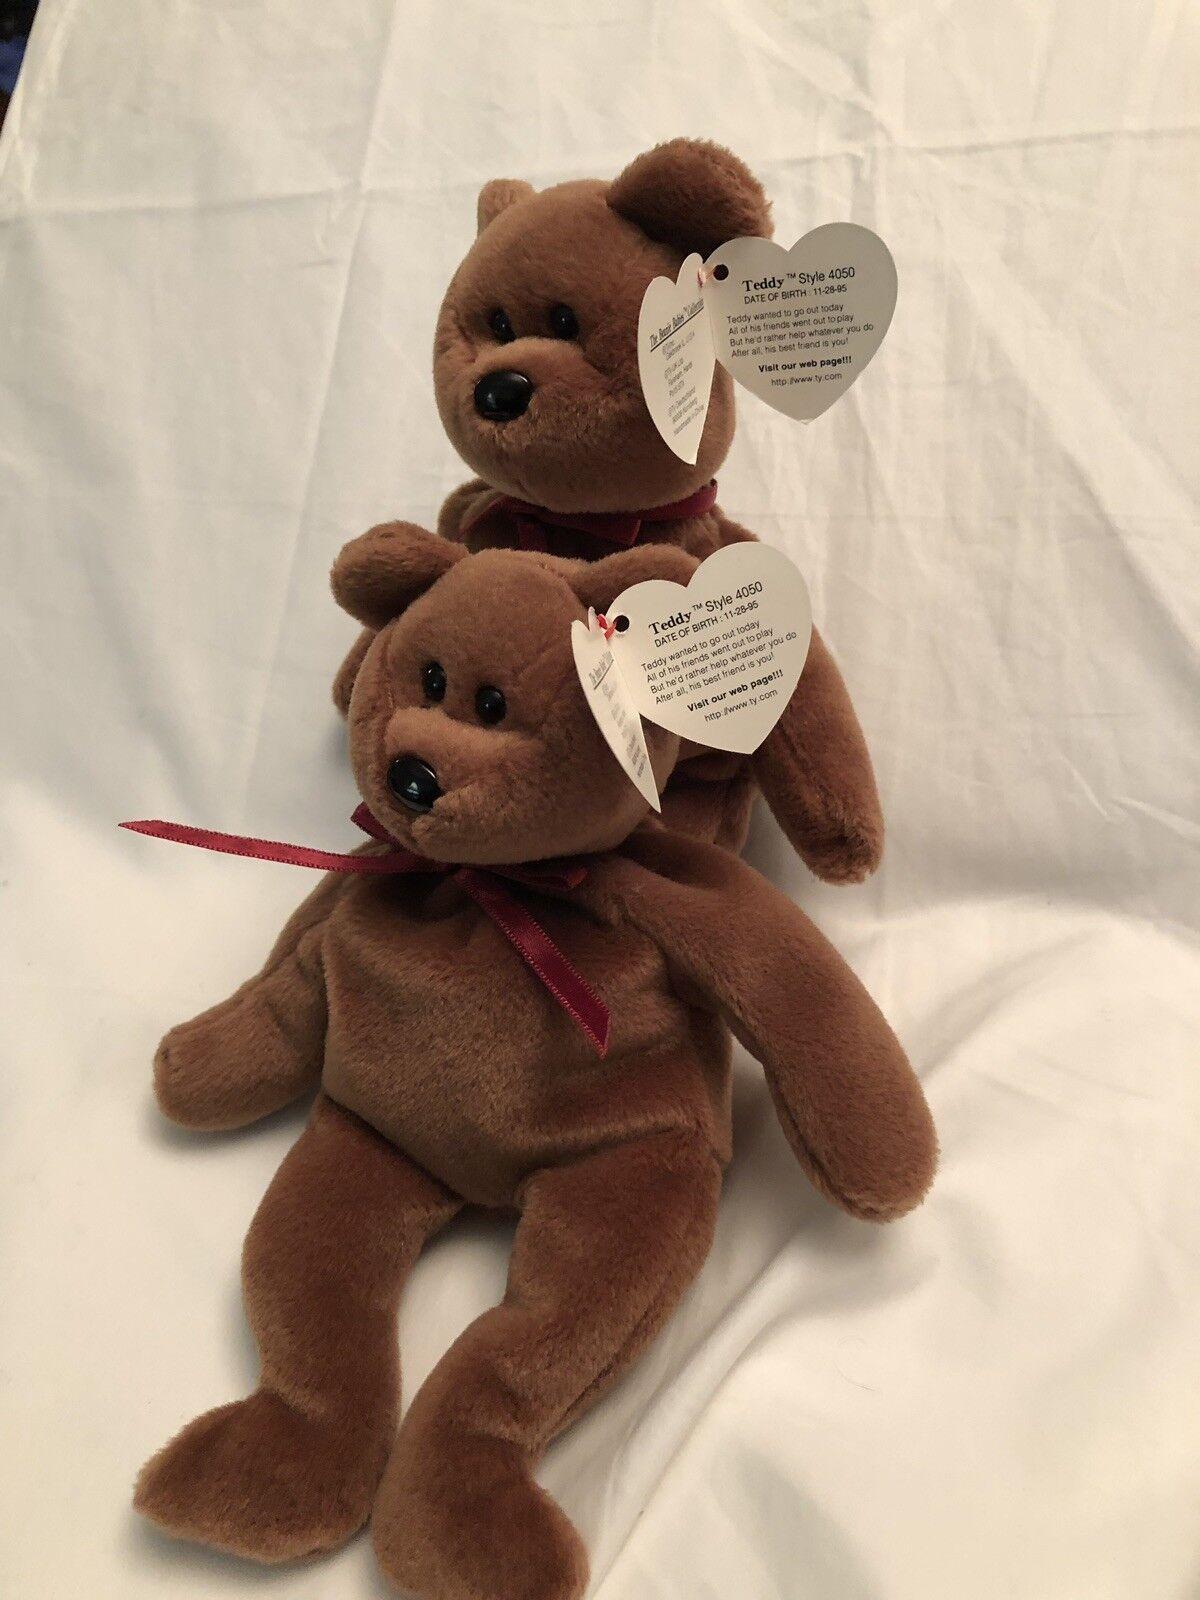 2 Ty Beanie Baby  TEDDY  The Bear Style Style Style 4050 - PVC TAG ERROR 1993 1995 - RETIRED 1cc460